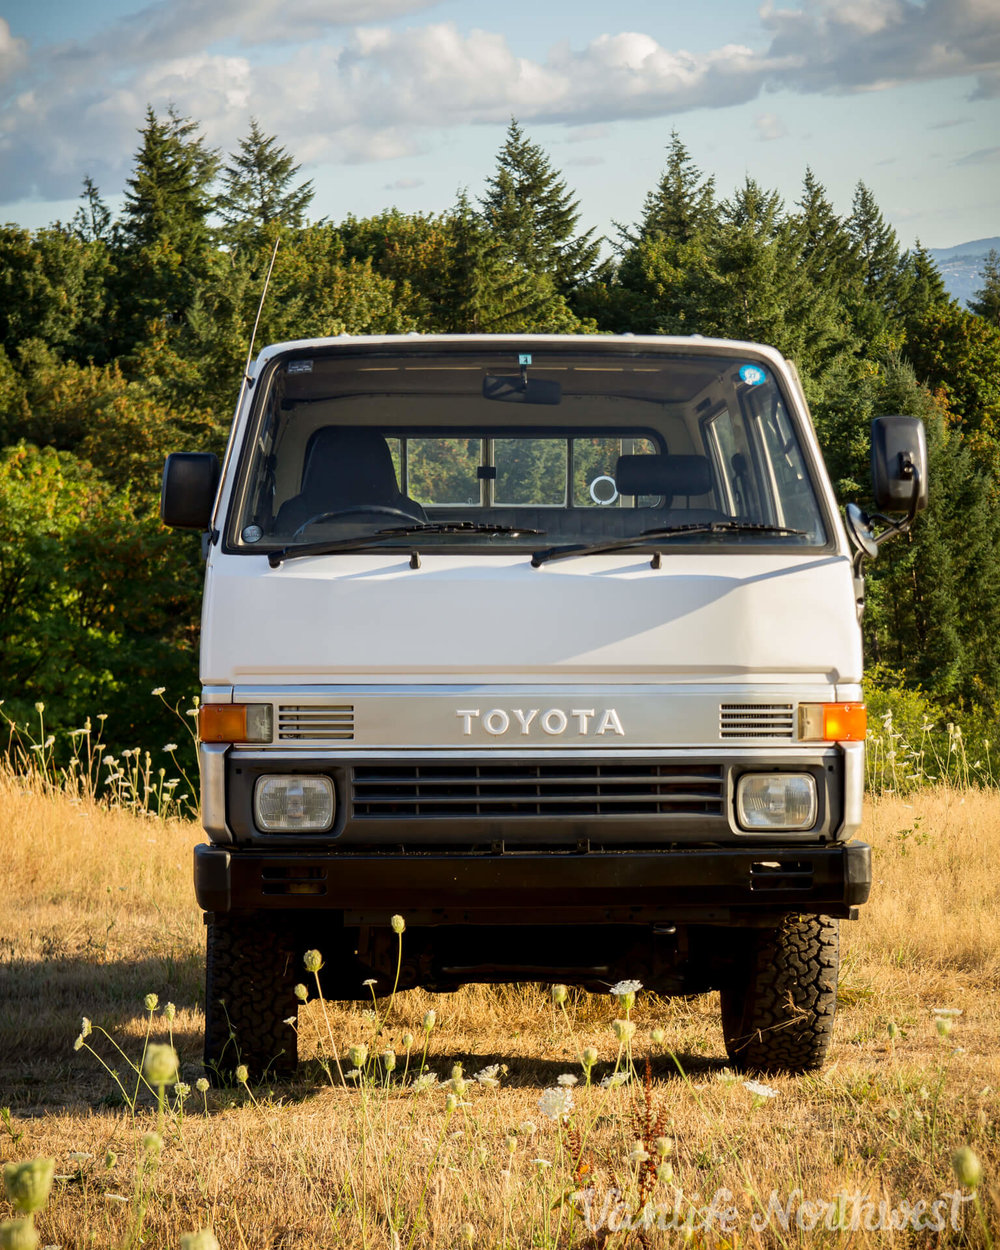 ToyotaHiaceLH85WhiteJosh-8.jpg